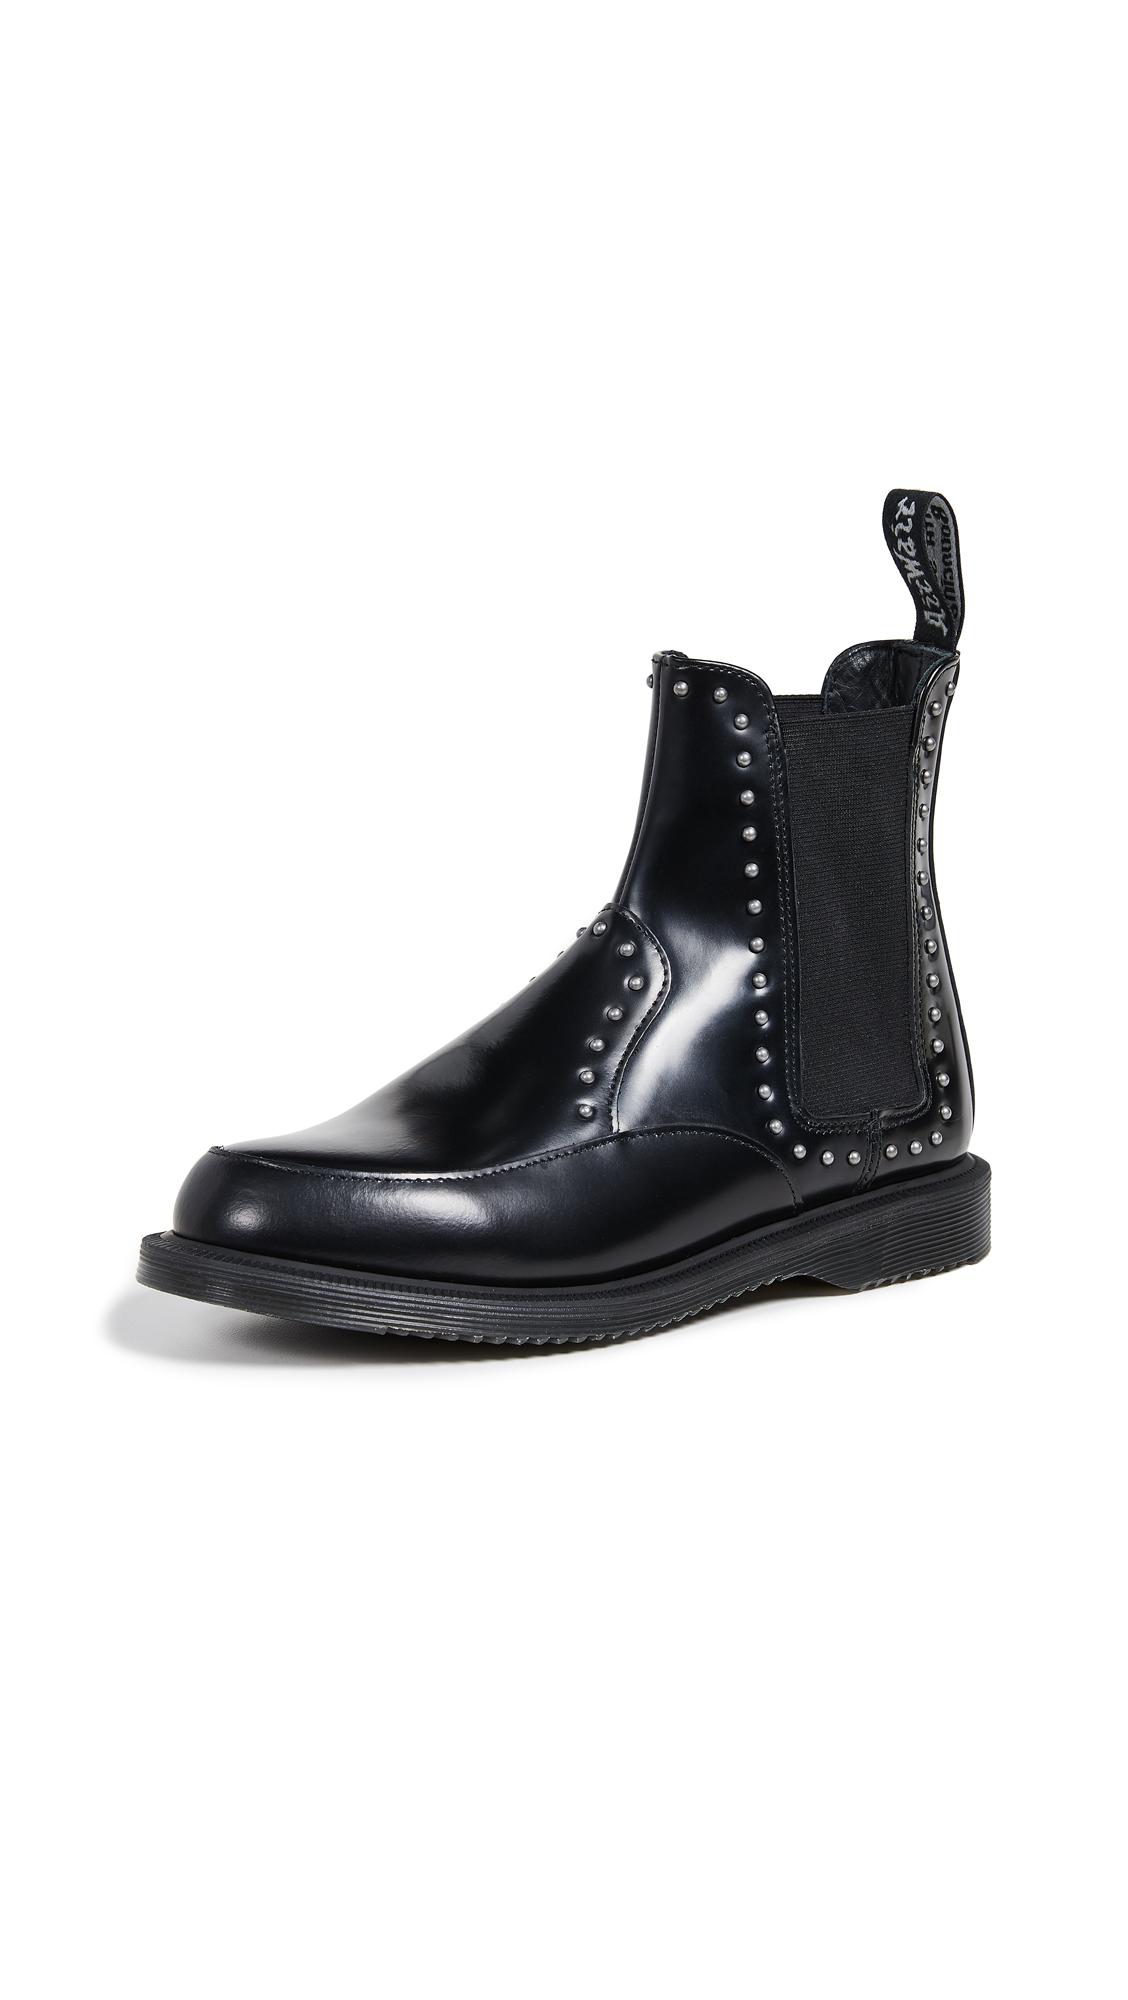 Dr. Martens Aimelya Stud Chelsea Boots - Black